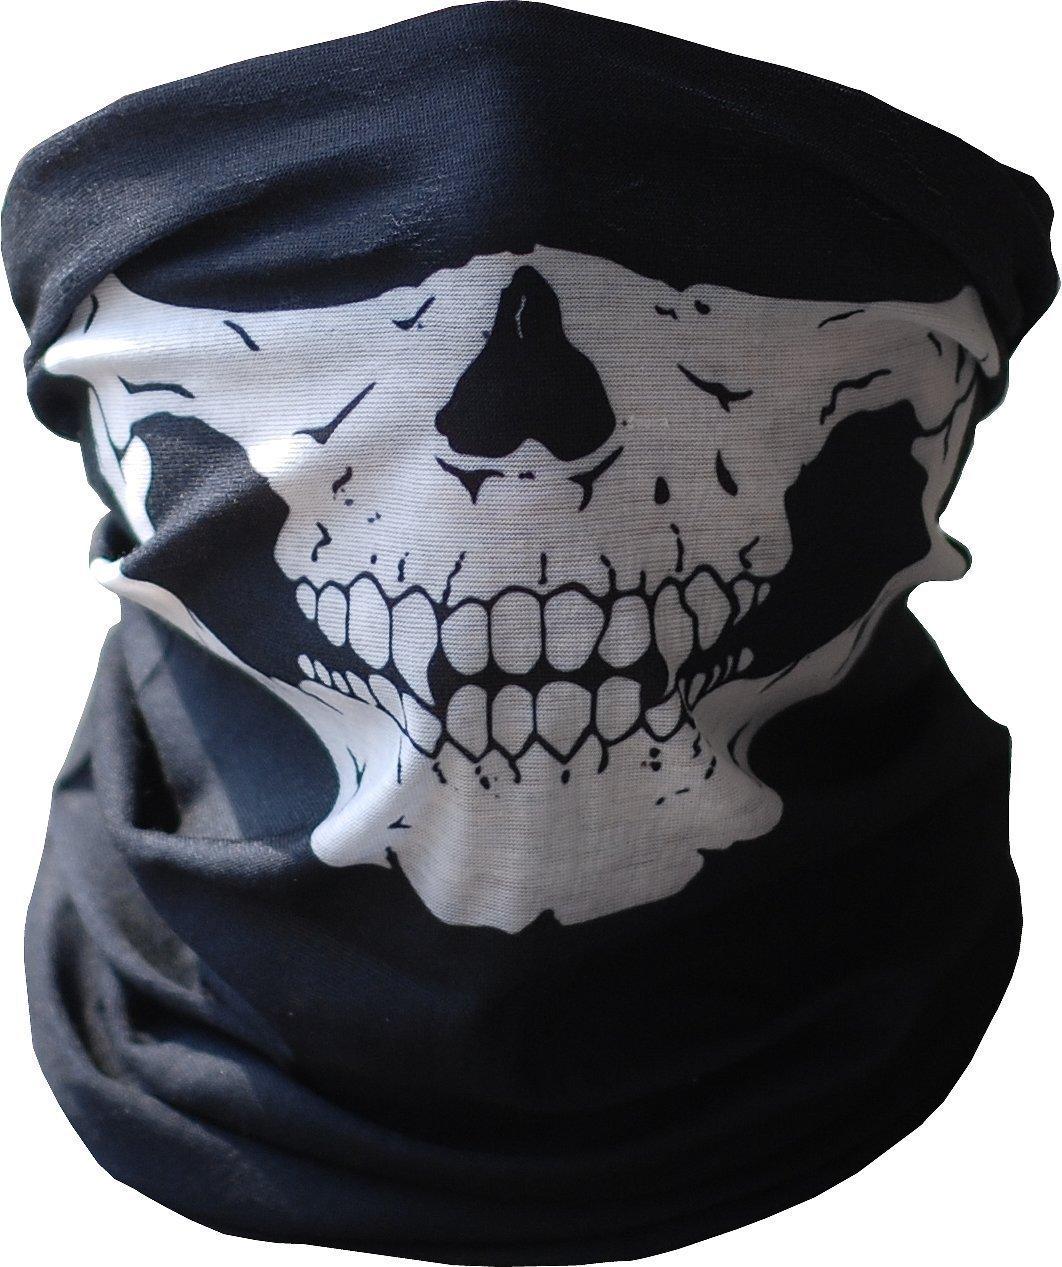 GODHL Skeleton Skull Half Face Neck Bandana Mask Scarf Rave Mask Black